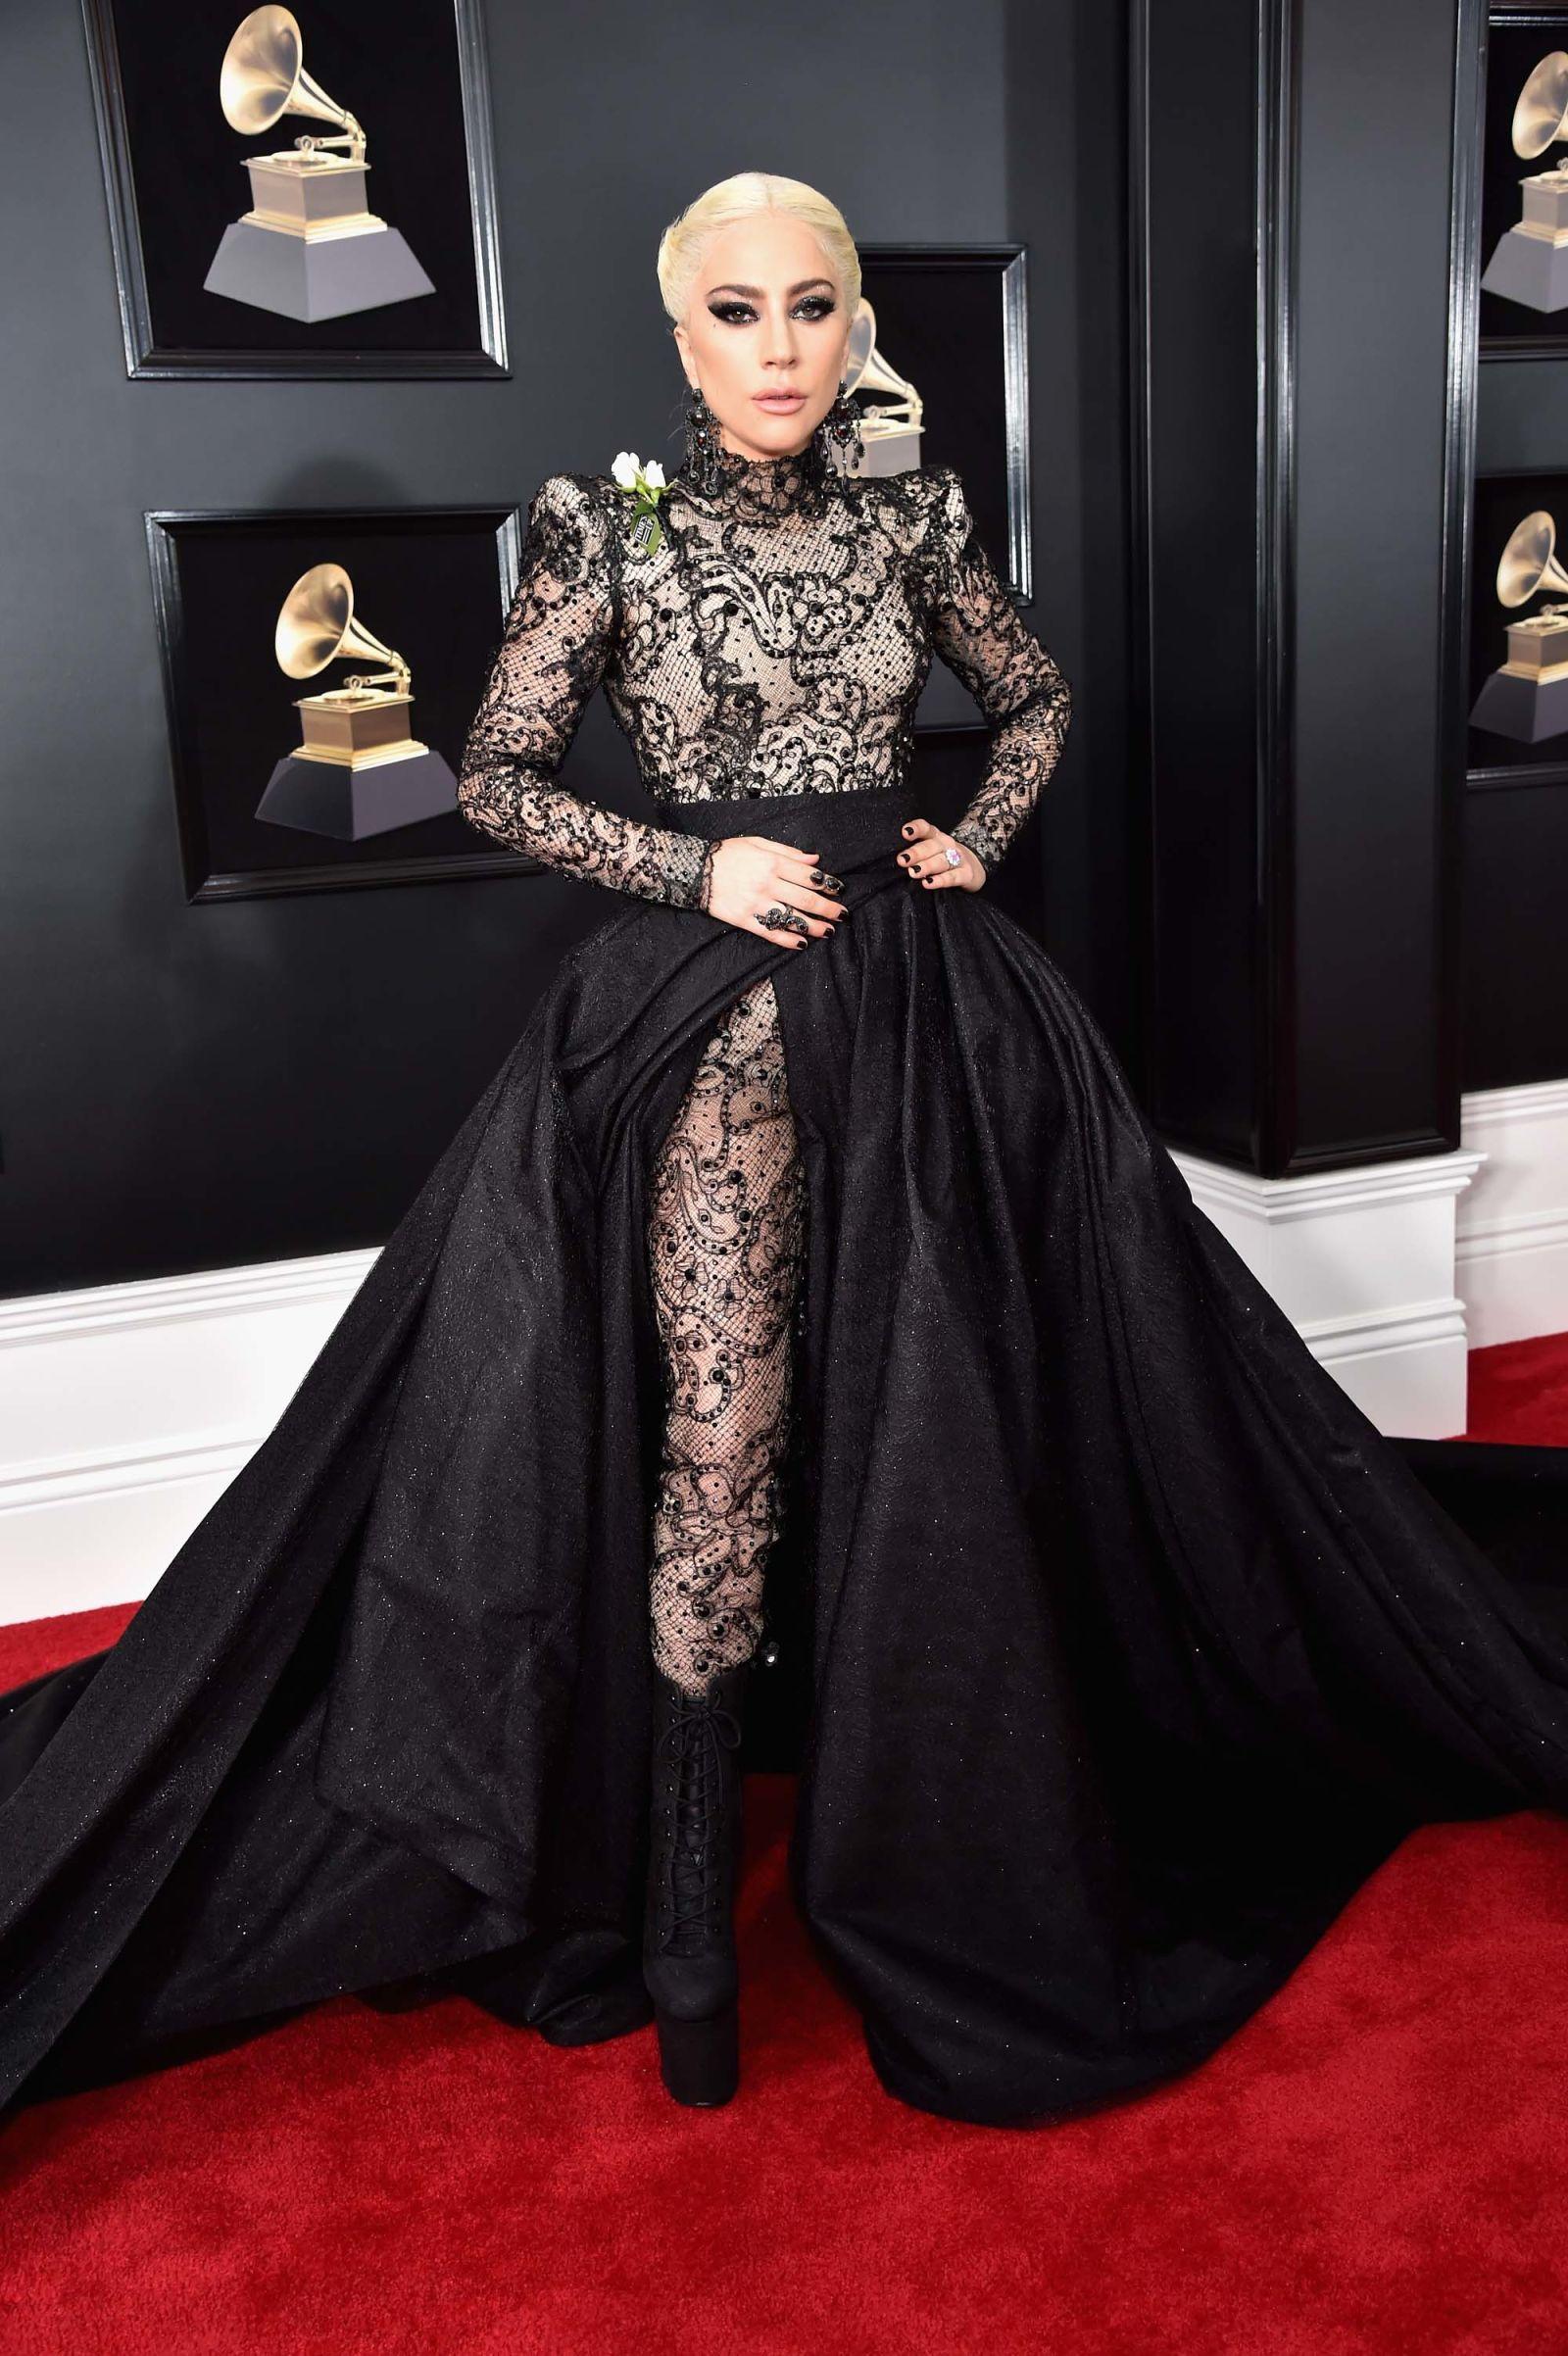 e67e21f94 Los Grammy 2018 se vistieron con rosas blancas | mother monster ...